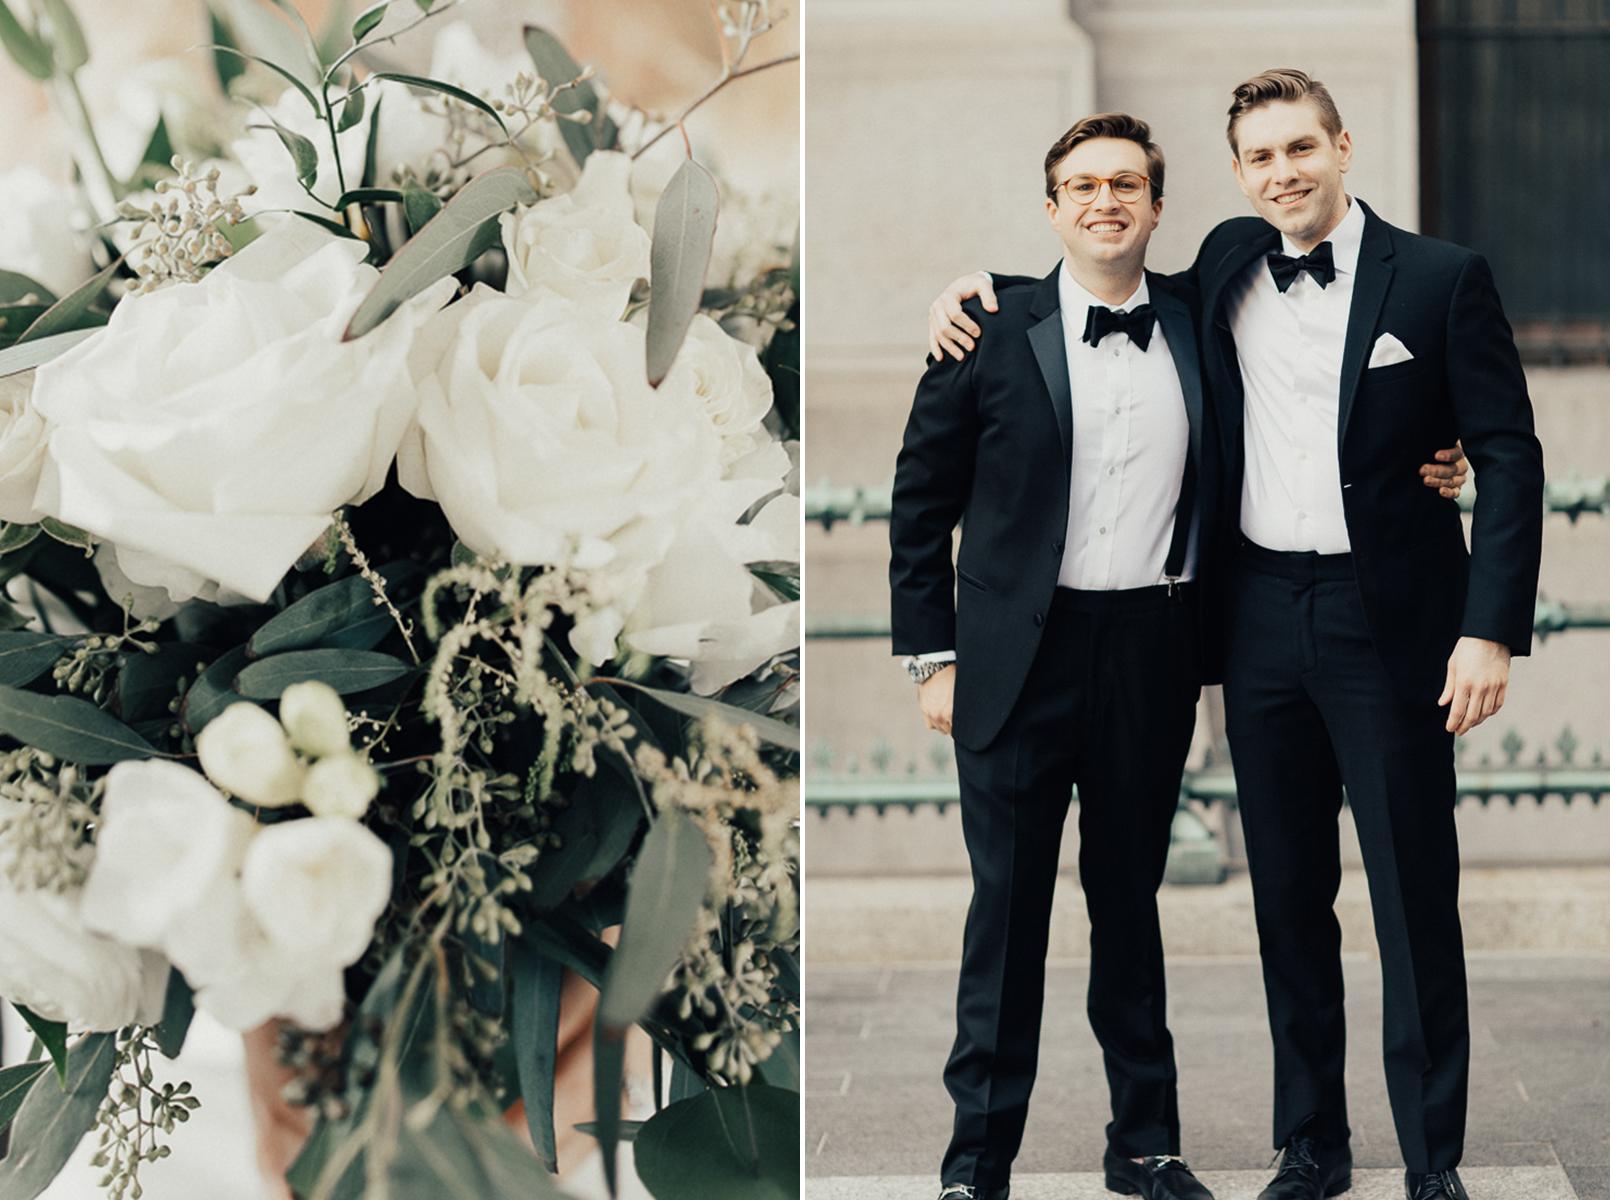 GACo_Allison-PJ-Wedding_021718-double-4.jpg